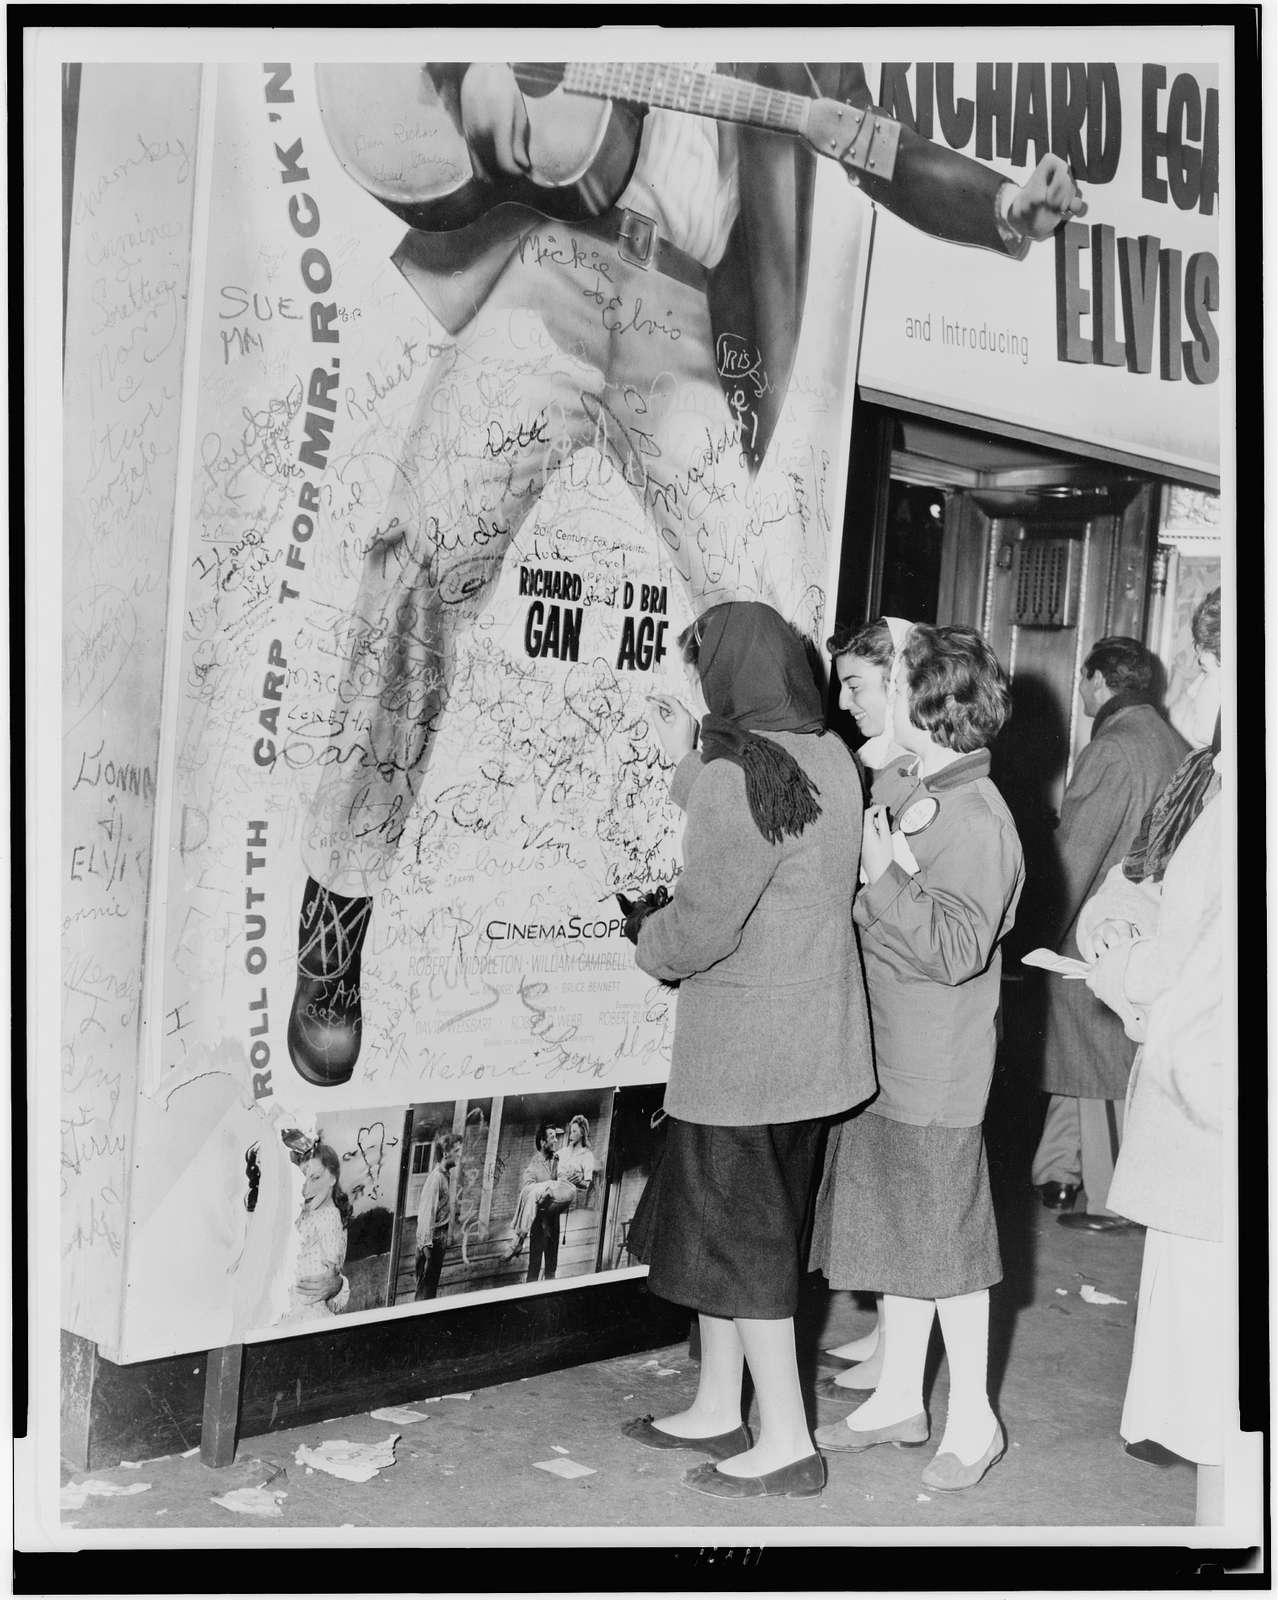 [Teenage girls add to grafitti on bottom of Elvis movie poster] / World Telegram & Sun photo by Phil Stanziola.